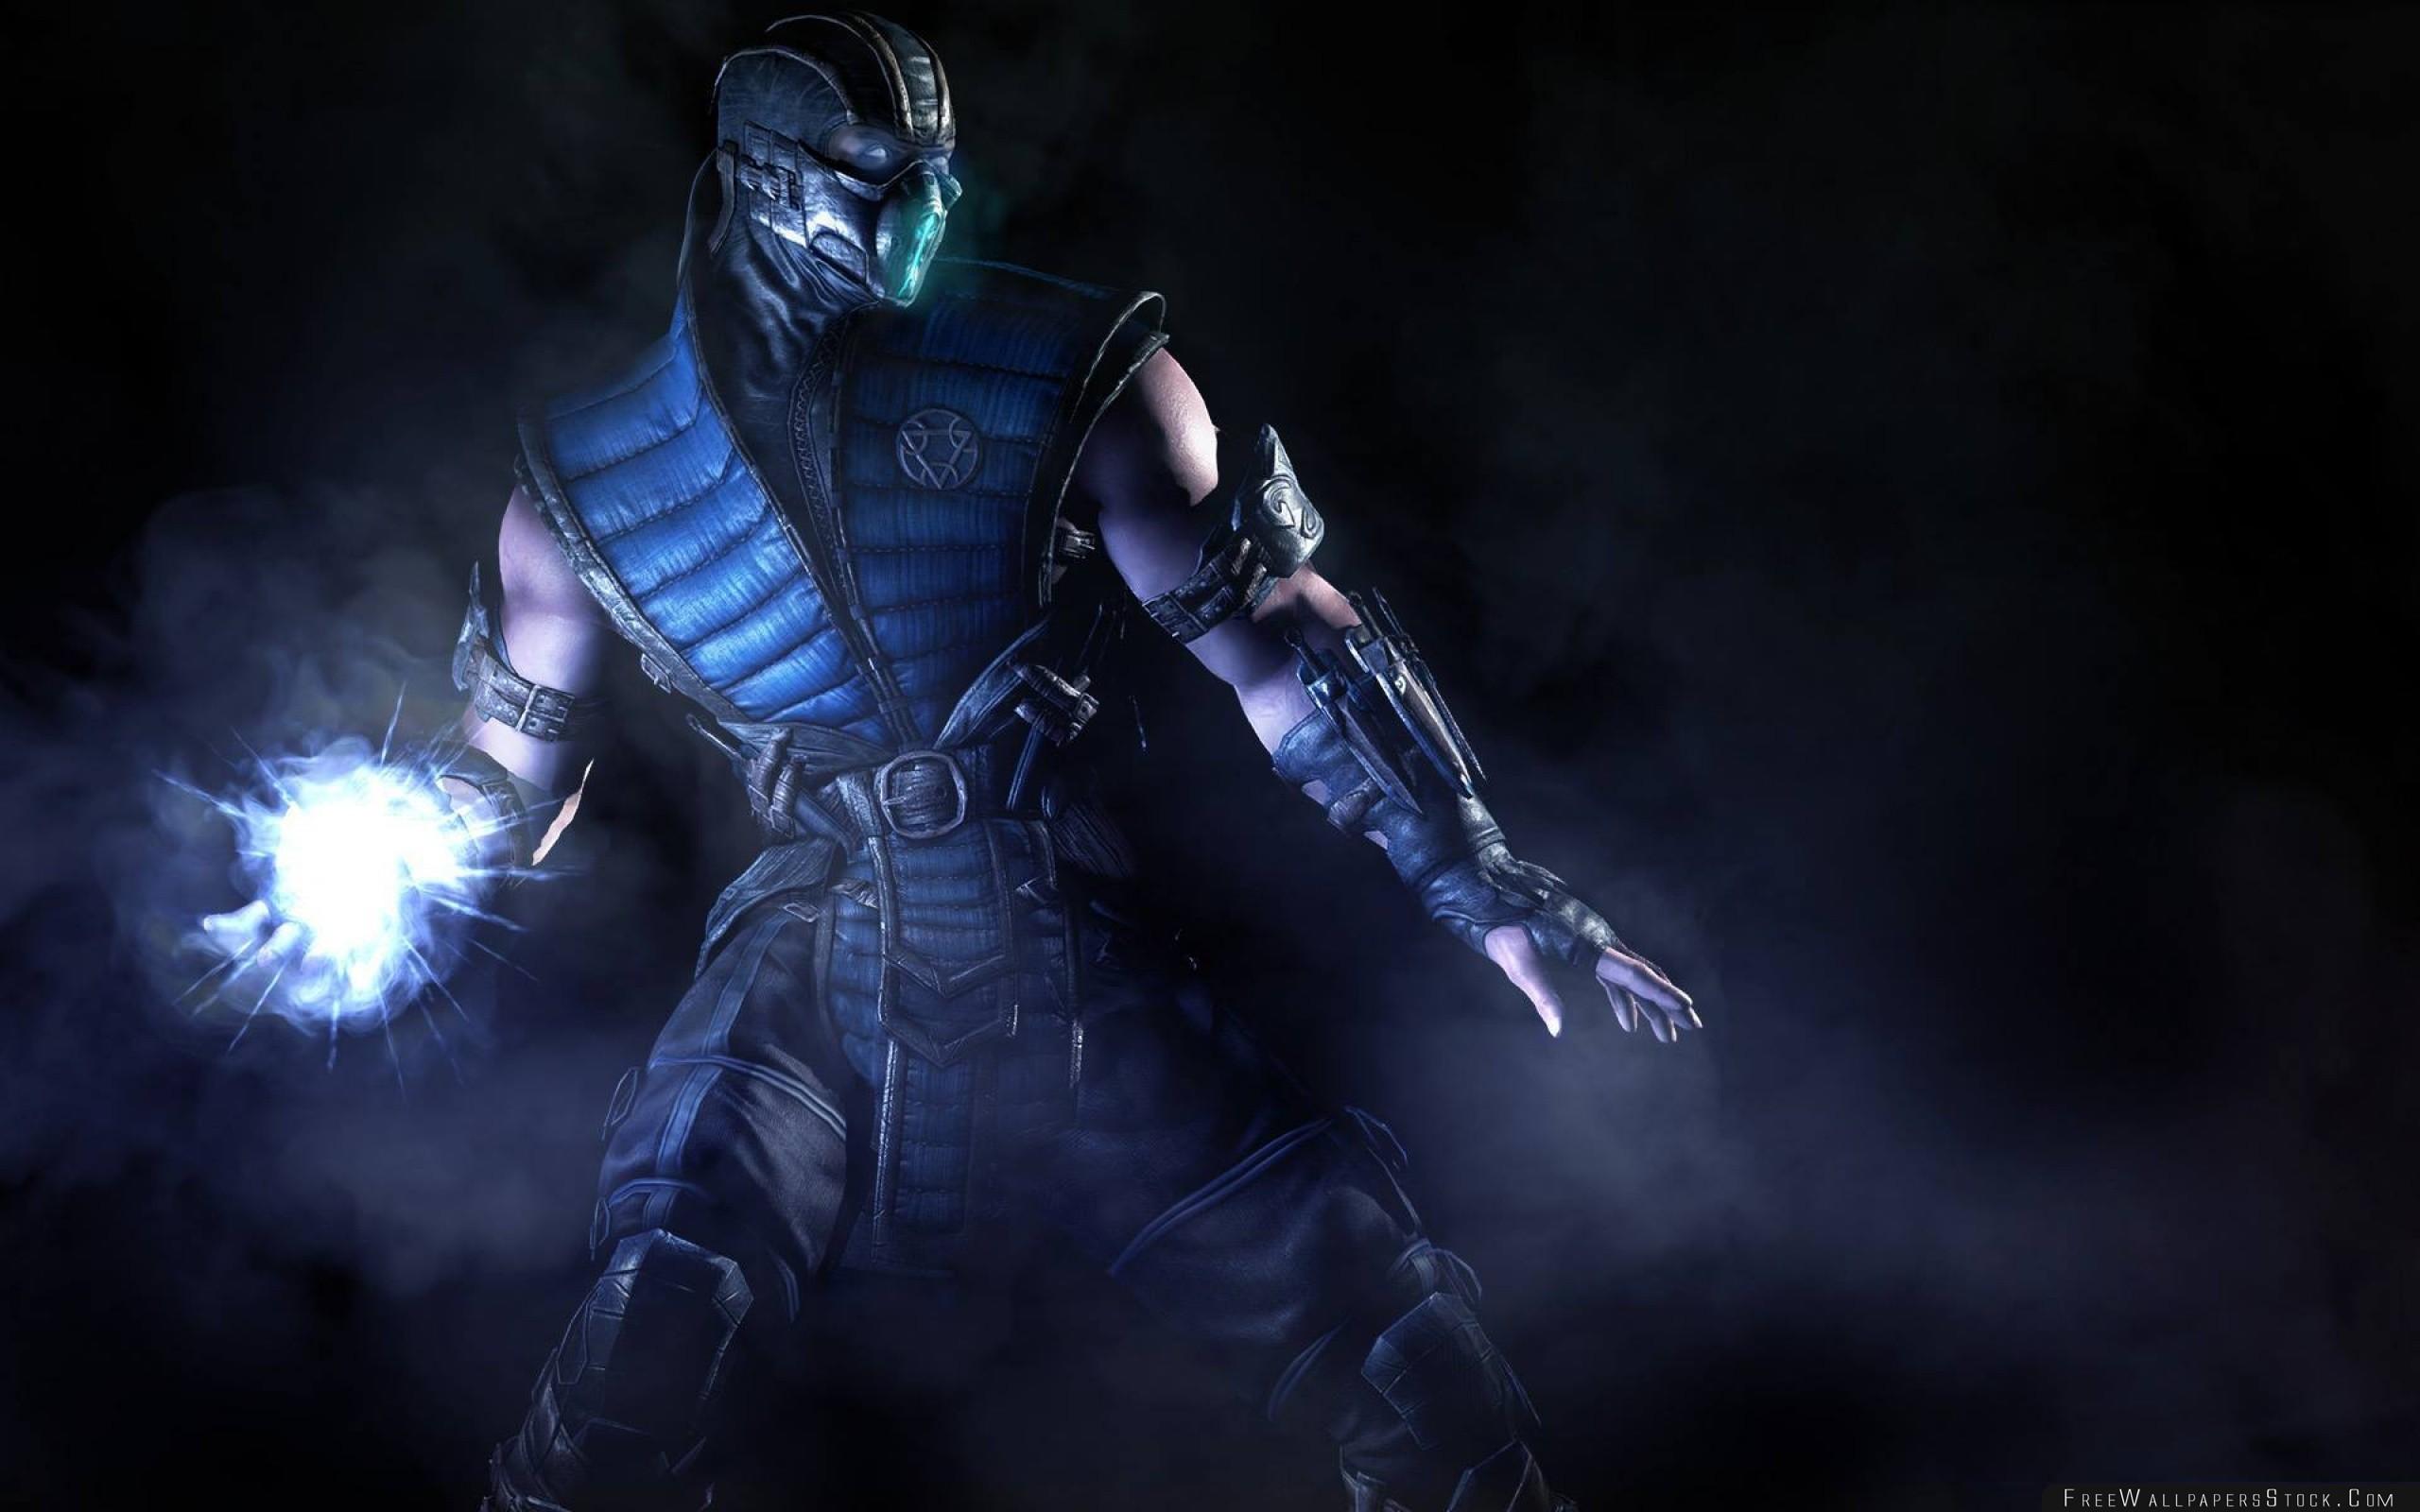 Download Free Wallpaper Mortal Kombat   Netherrealm Studios Sub Zero Warner Bros Interactive Entertainment